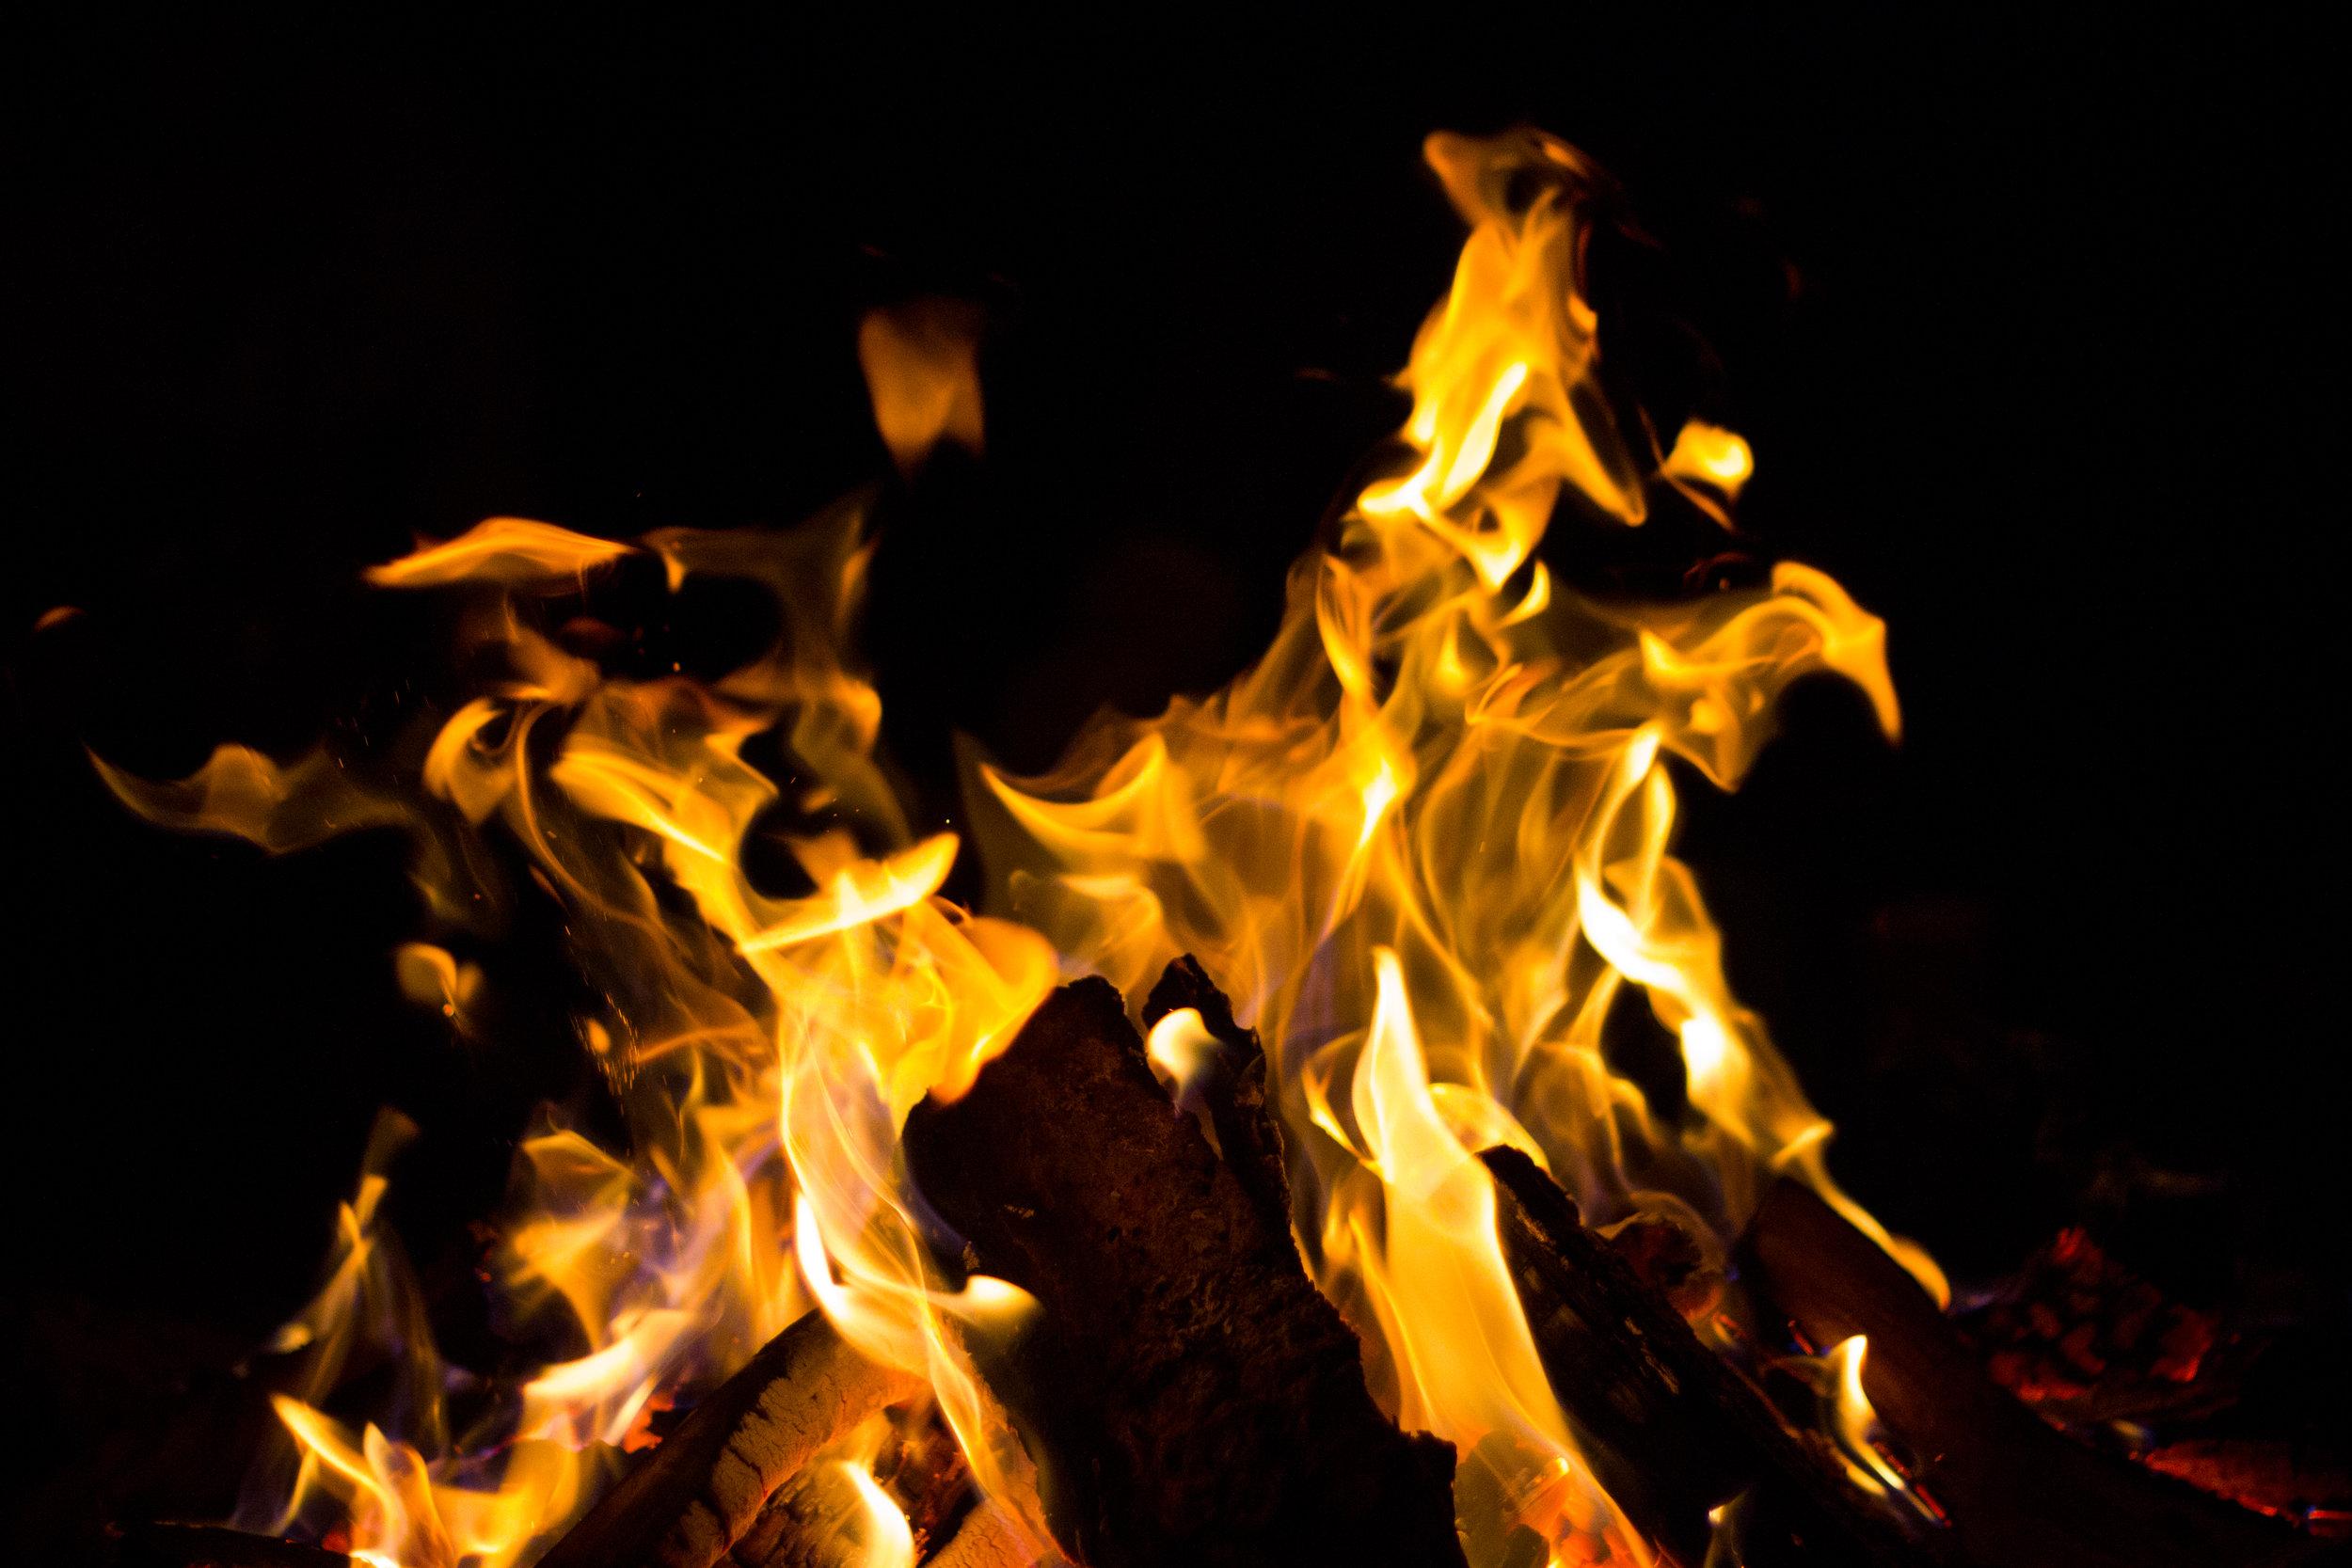 Fire OG | Booklexia Content Marketing, cannabis content marketing, cannabis marketing